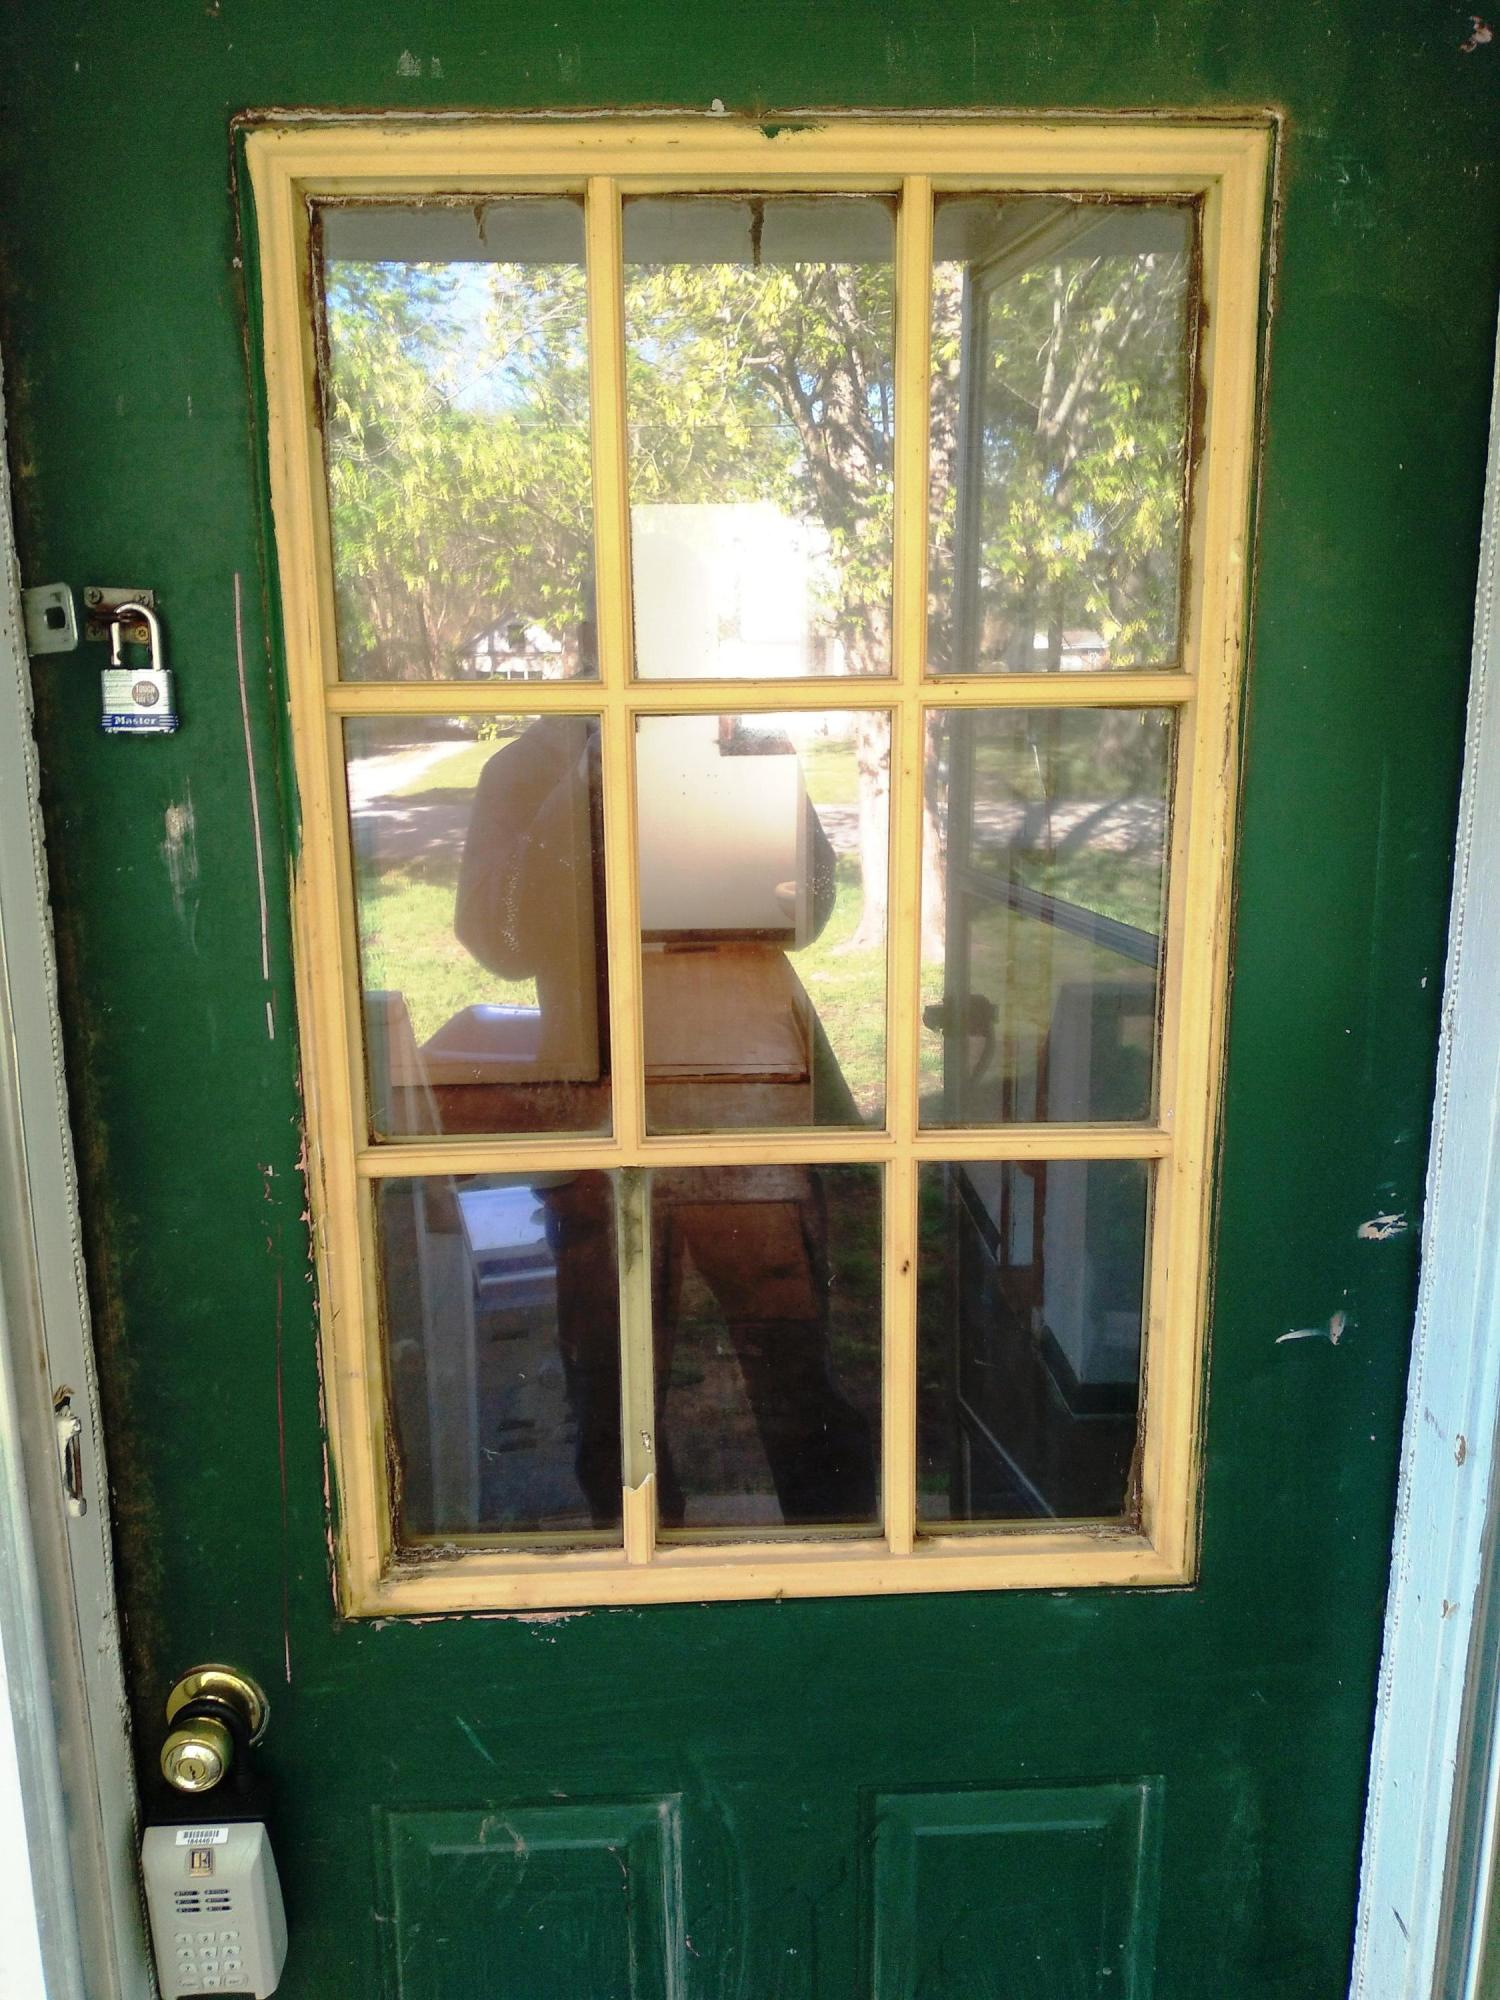 Closed | 532 N Brewer St Vinita, OK 74301 1